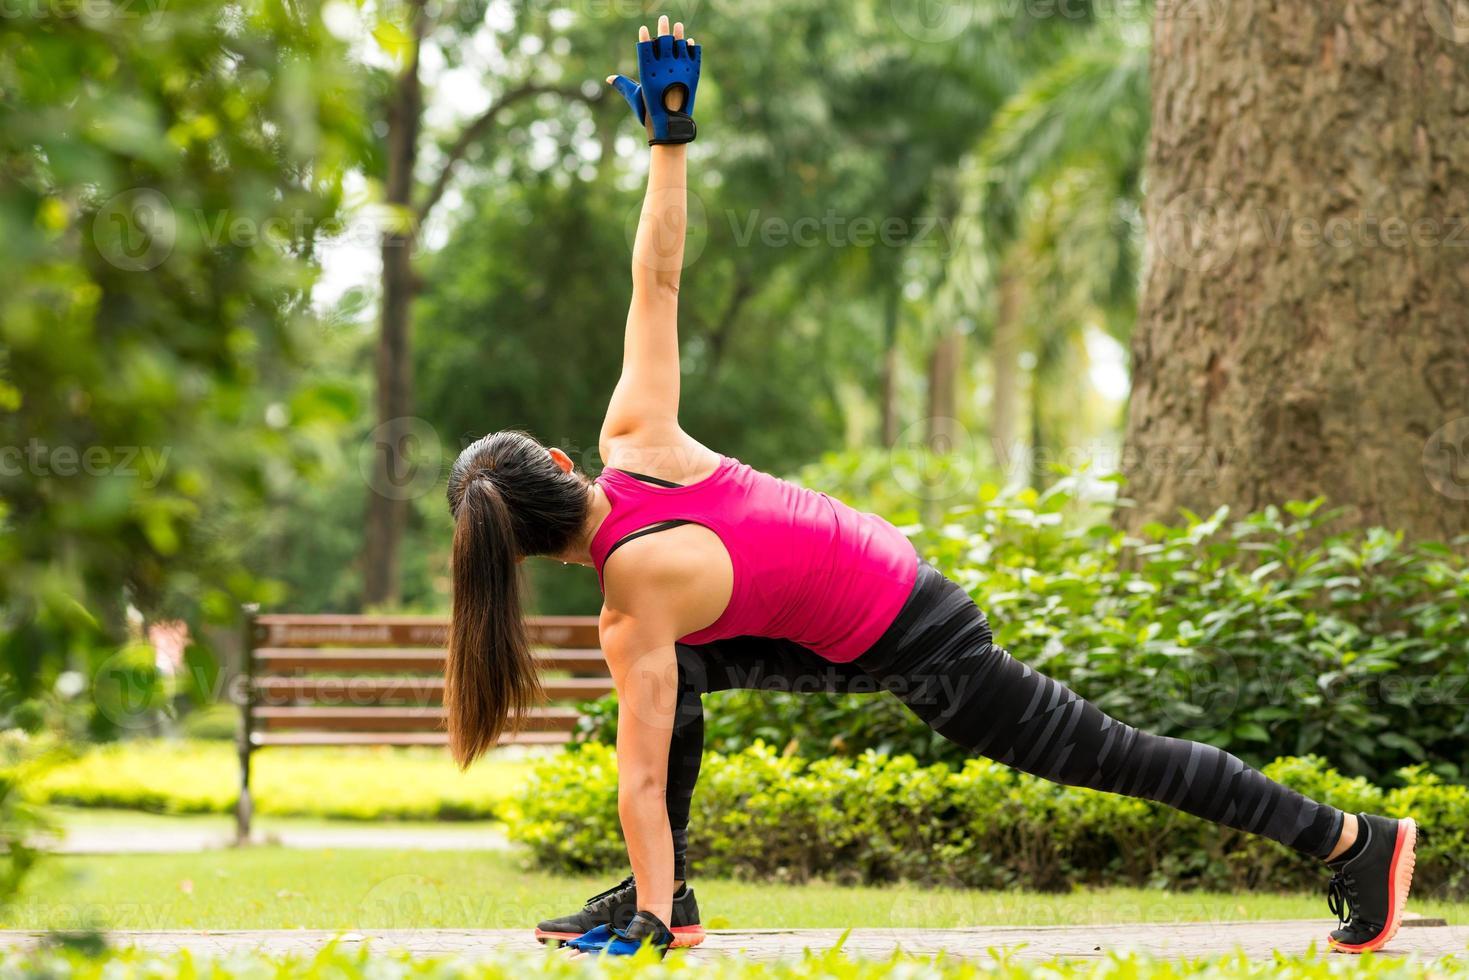 Doing exercises photo